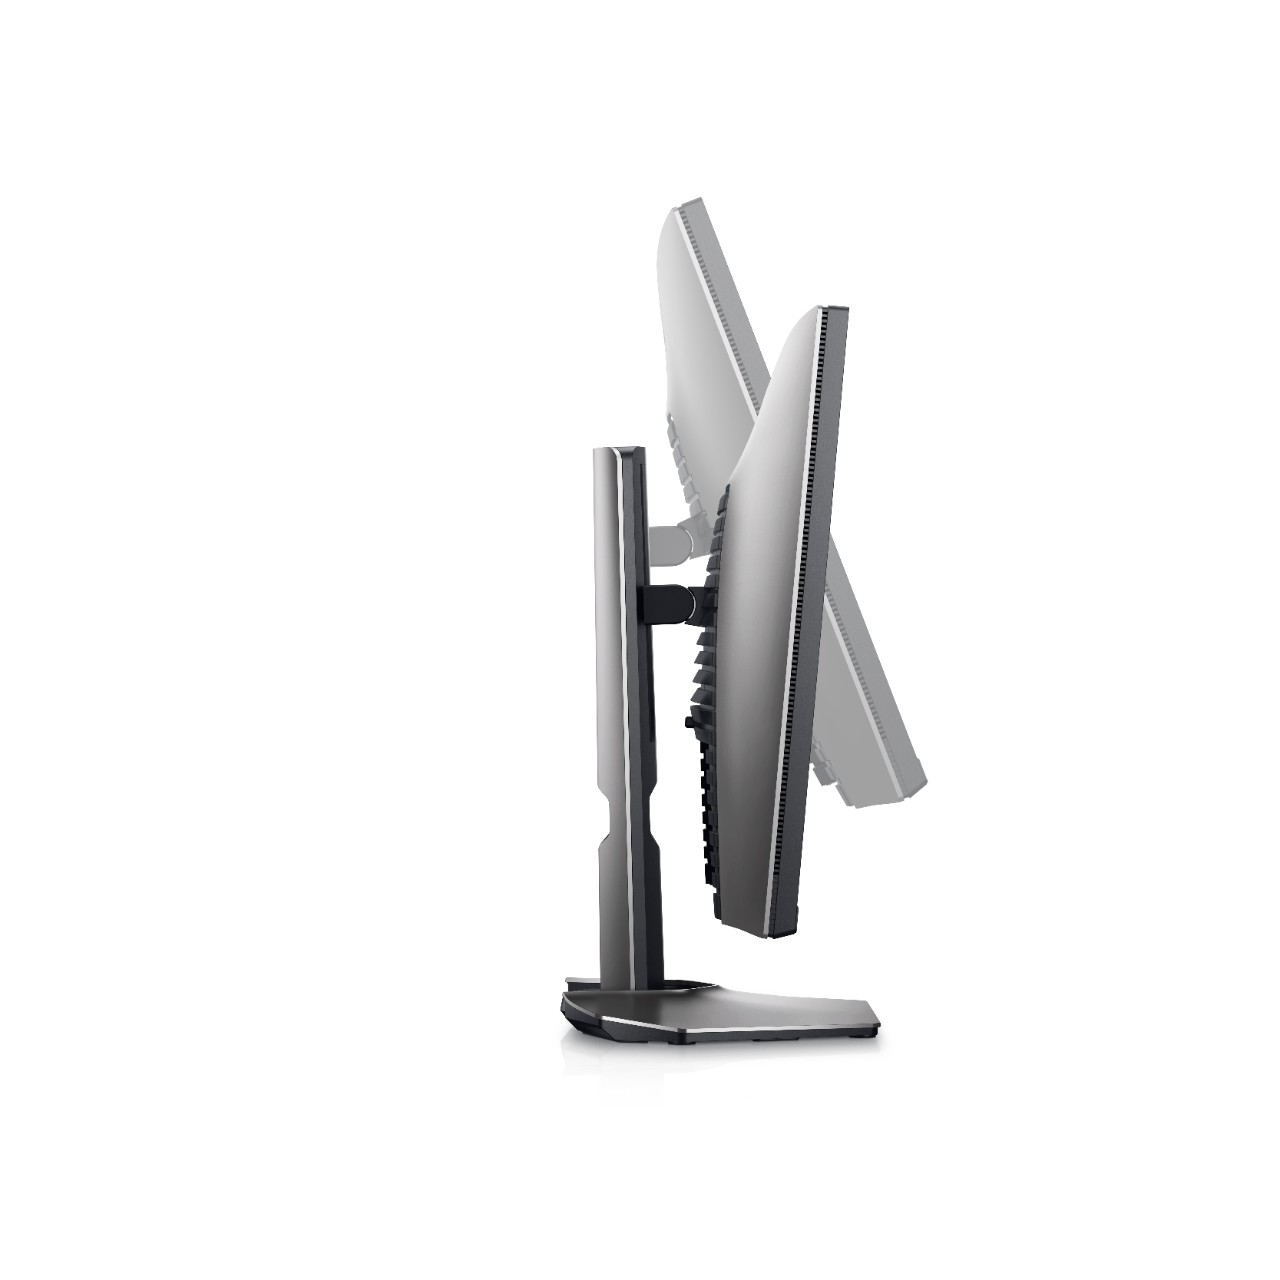 Dell S2721DGF Gaming Monitor